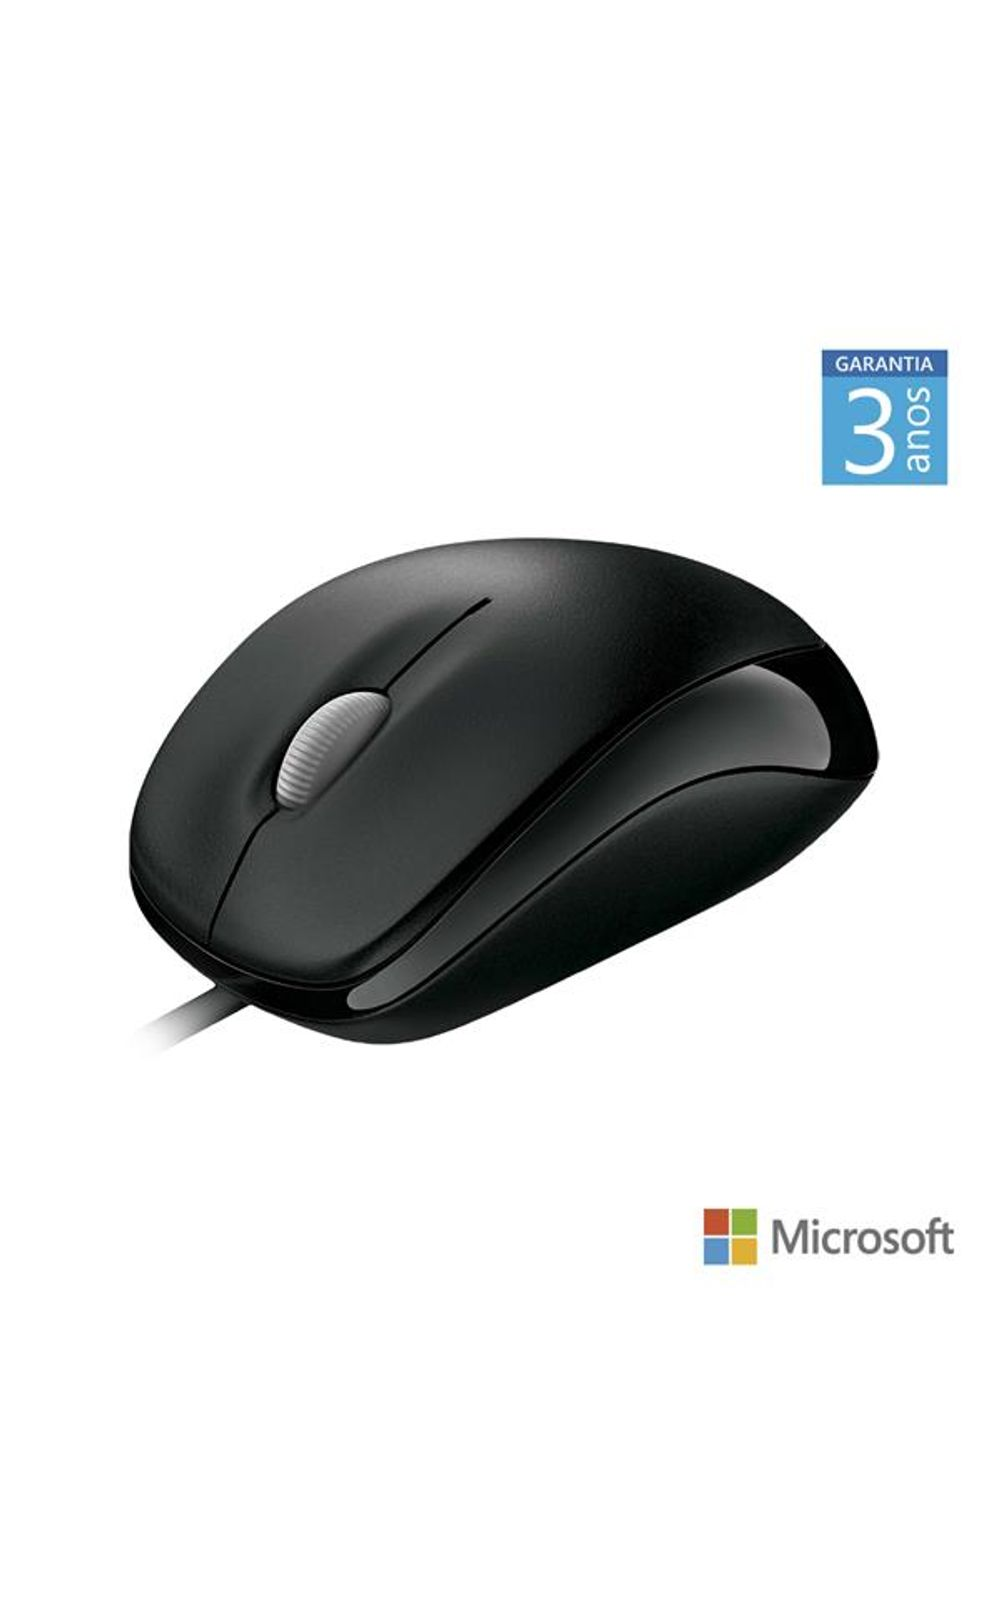 Foto 1 - Mouse Com Fio Compact Usb Preto Microsoft - U8100010